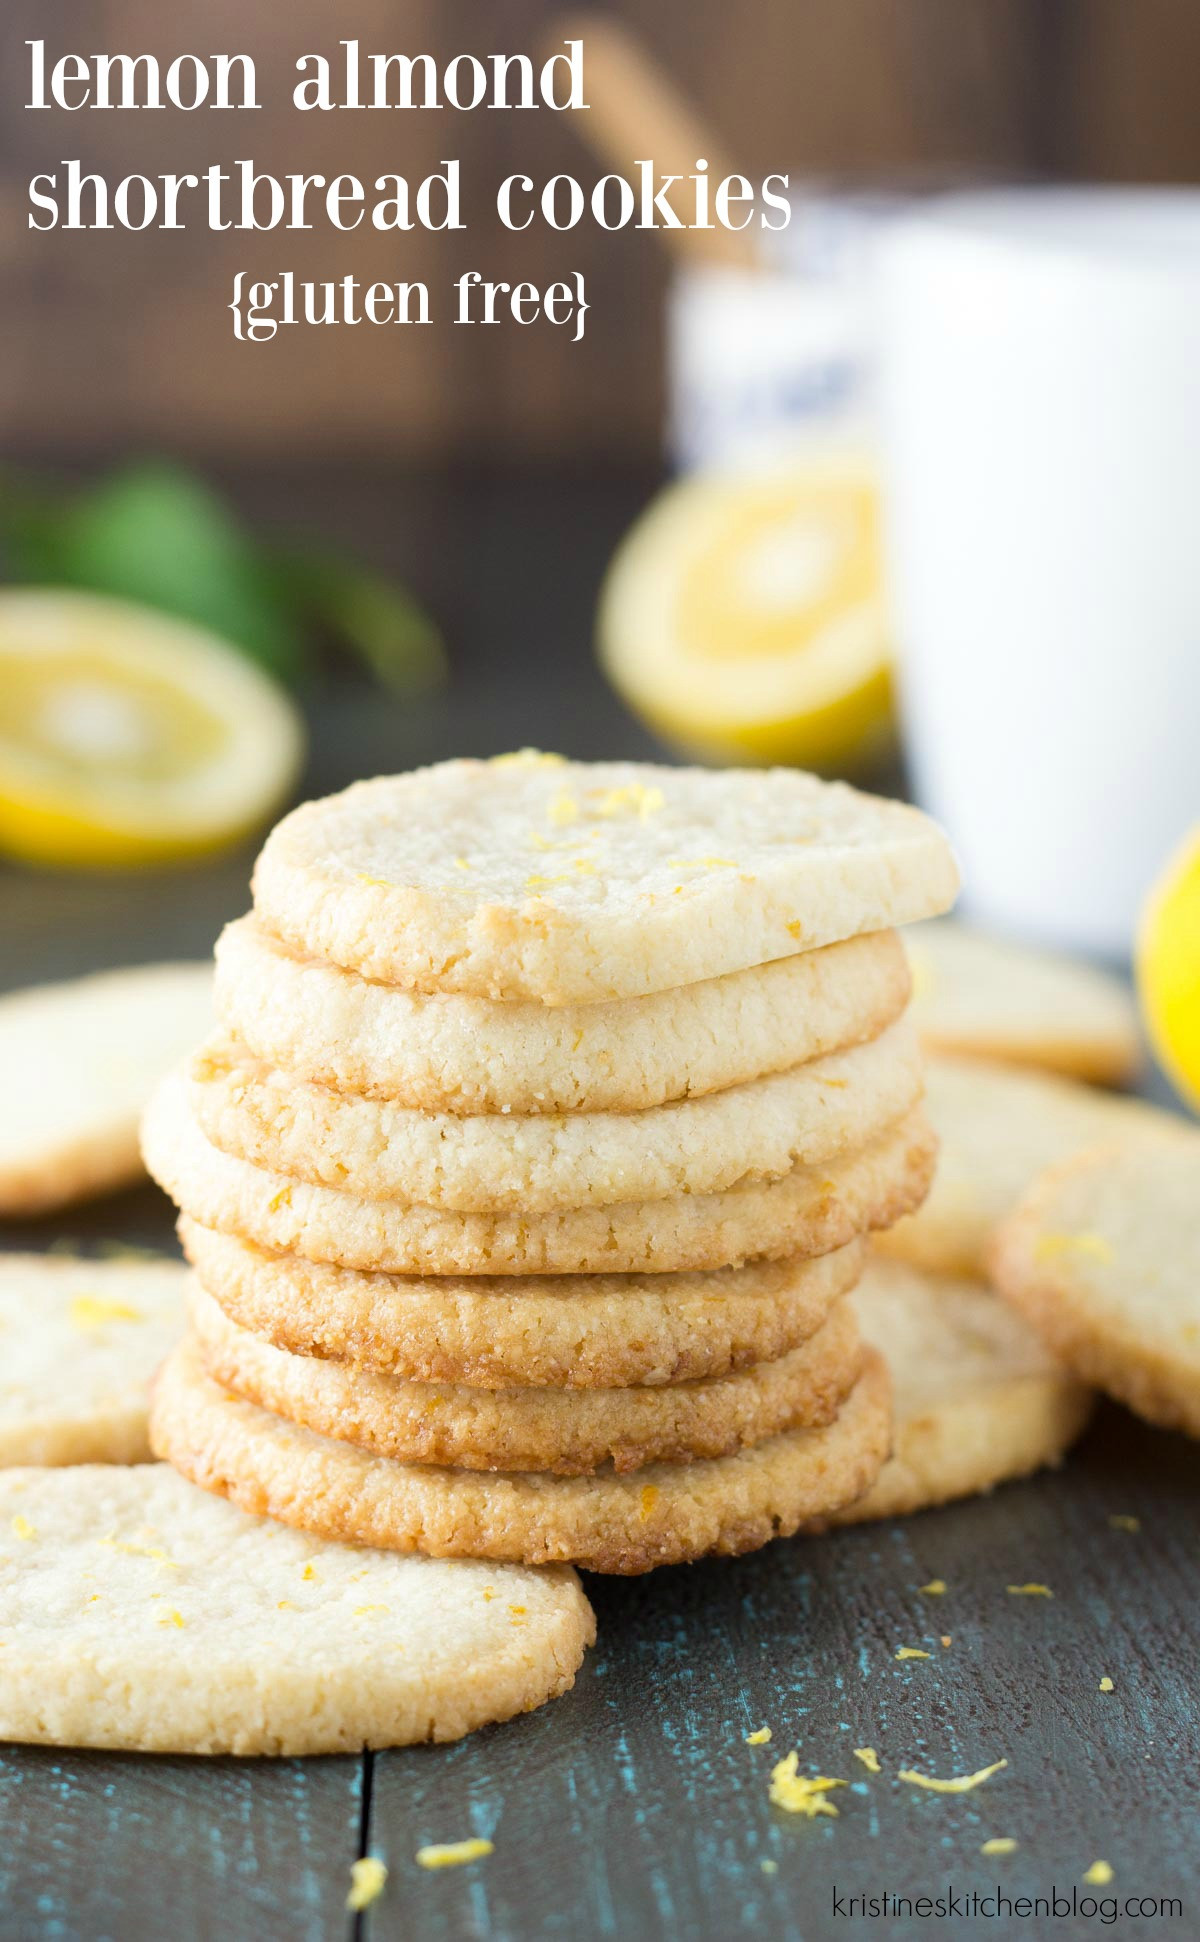 Almond Shortbread Cookies  Lemon Almond Shortbread Cookies Gluten Free Kristine s